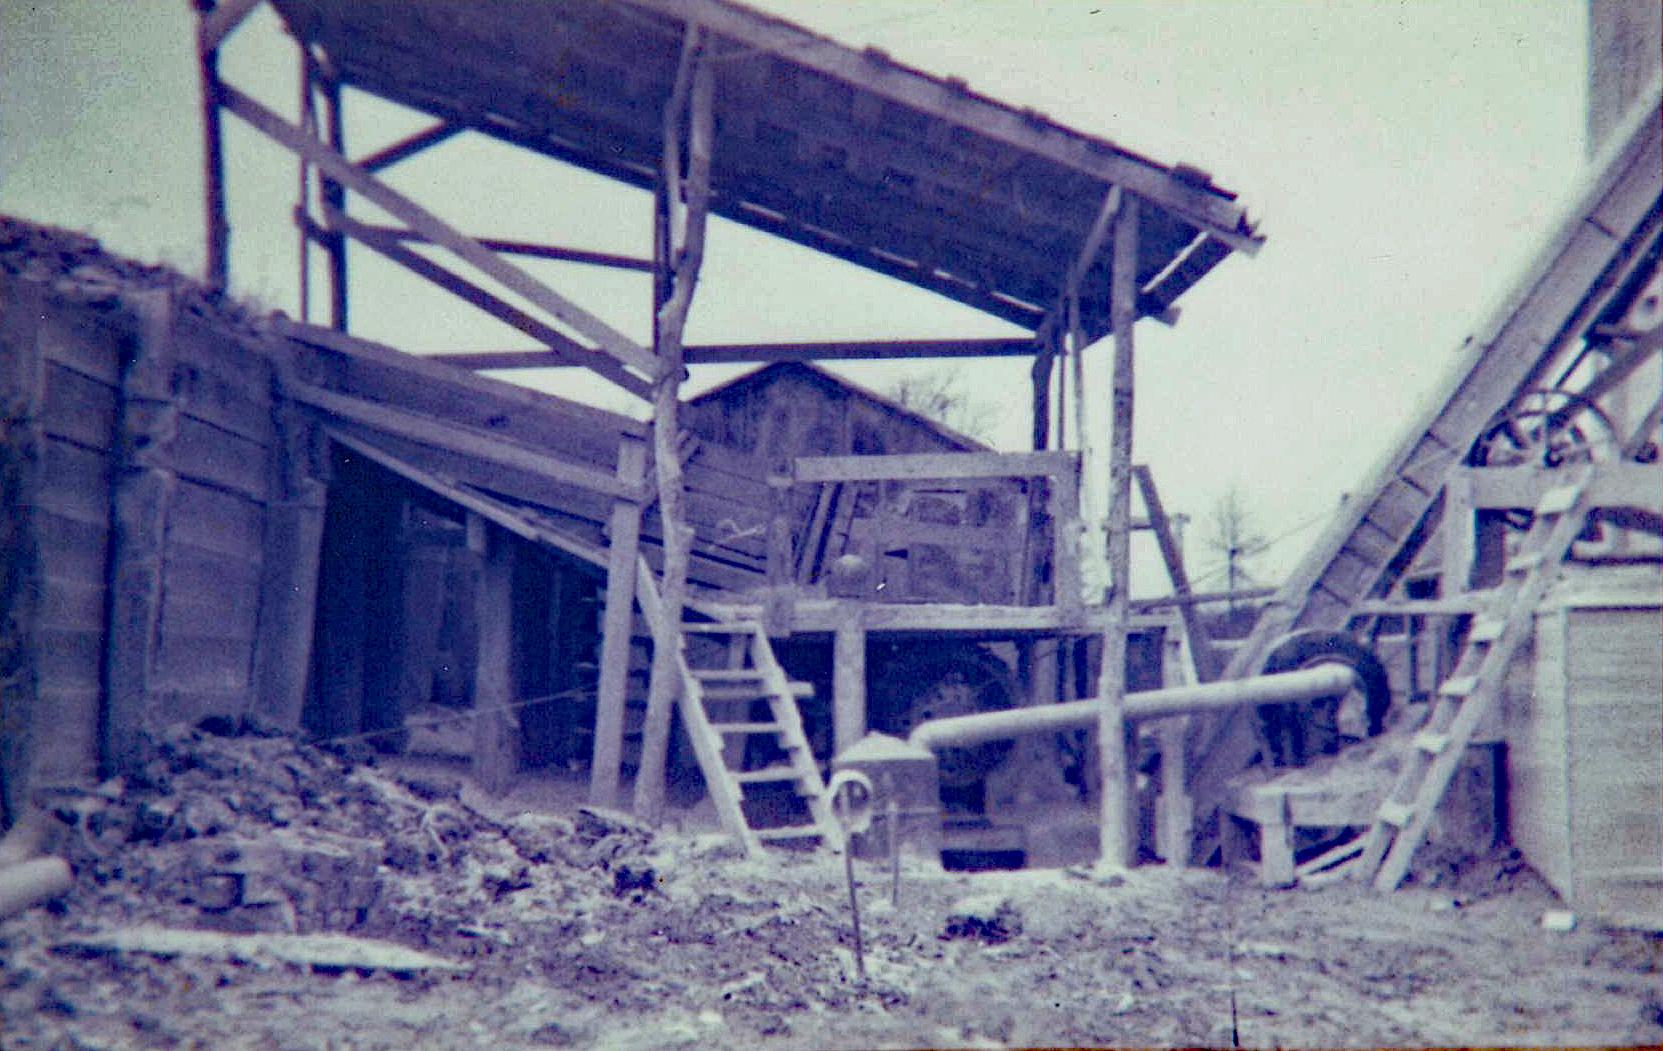 Van Tarble's original quarry